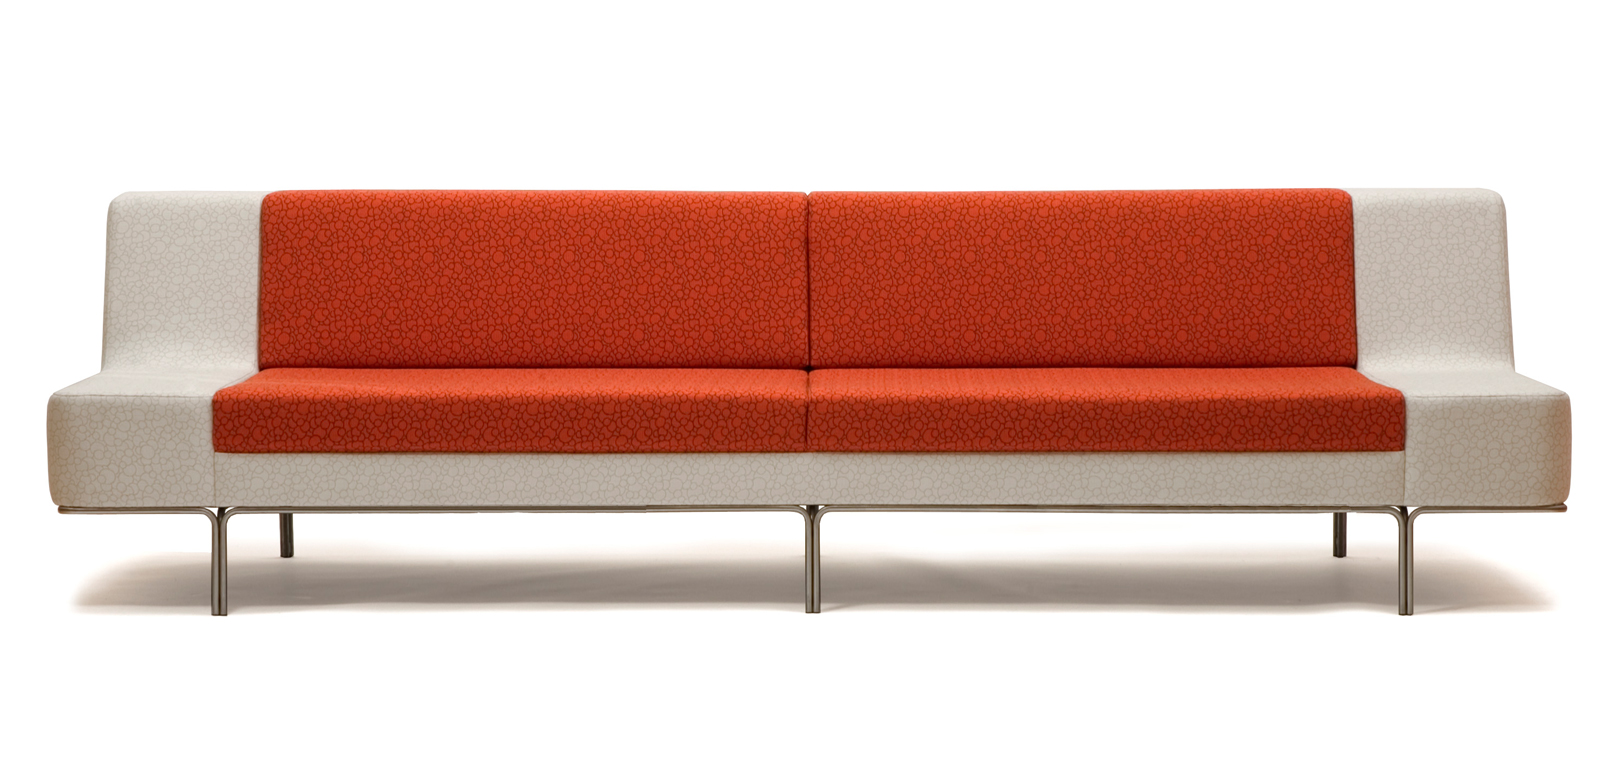 Home Furniture Furniture Adorable Modern Home Design Inspirations